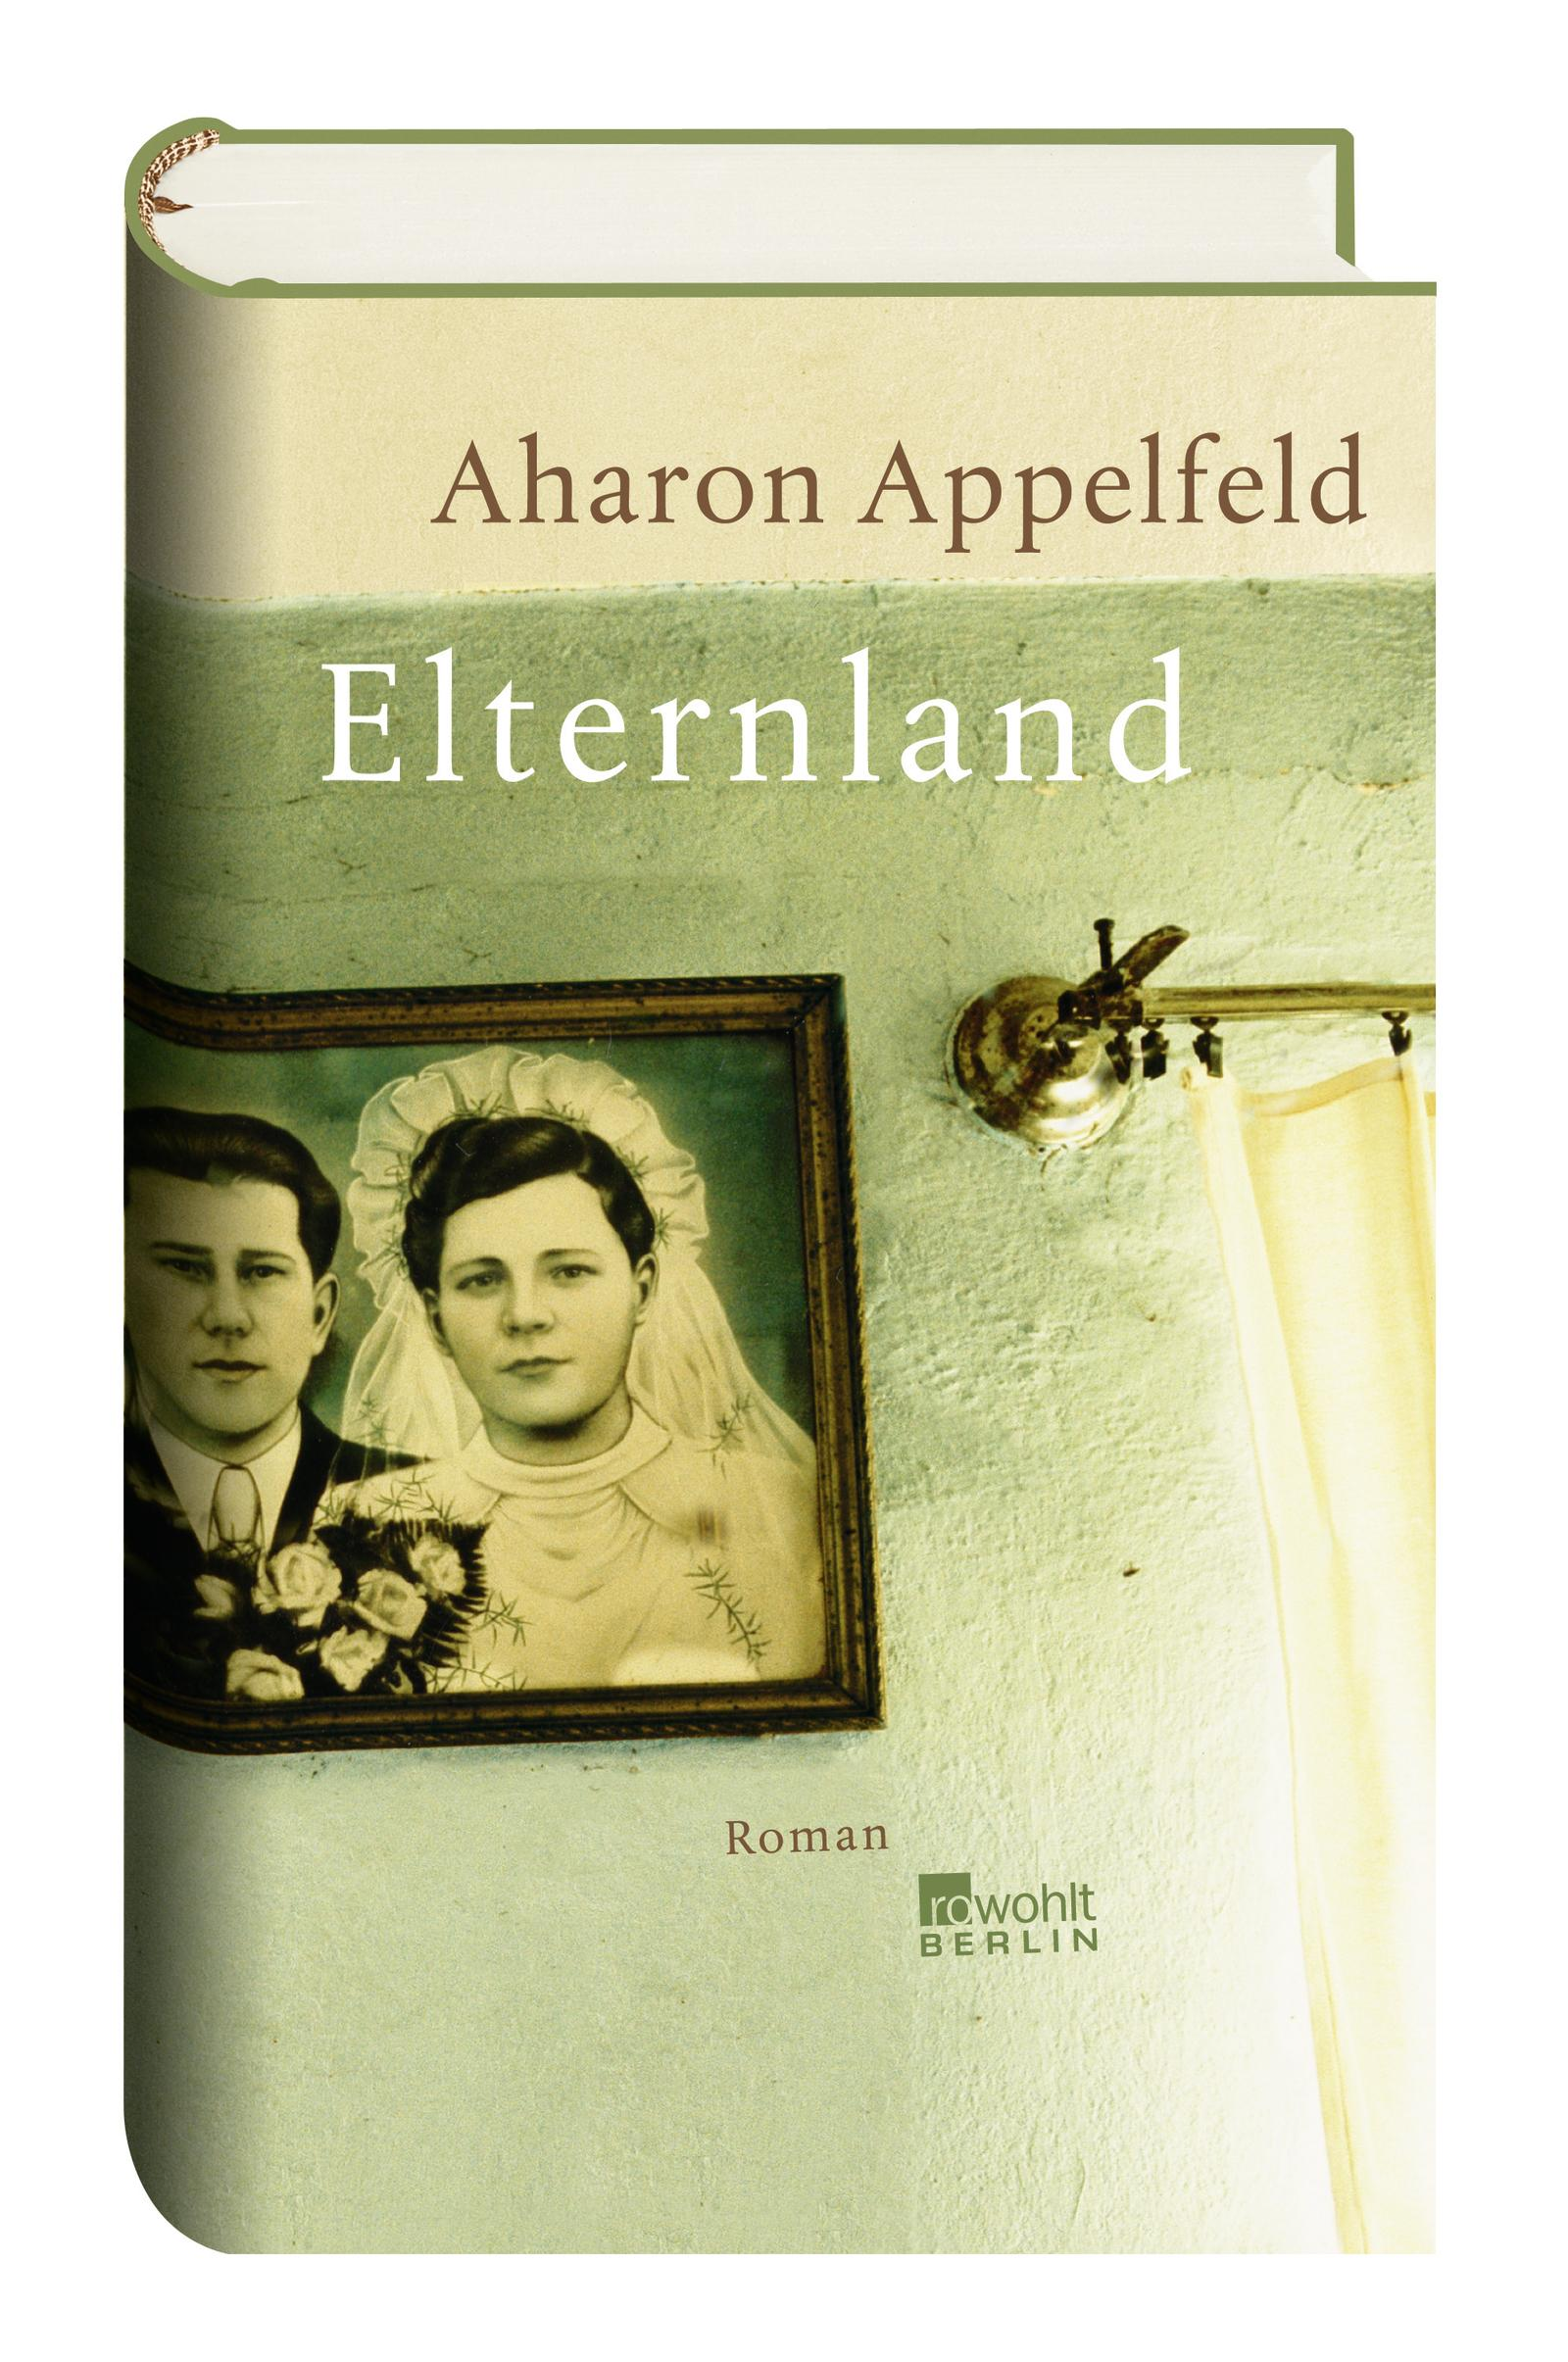 NEU-Elternland-Aharon-Appelfeld-345517